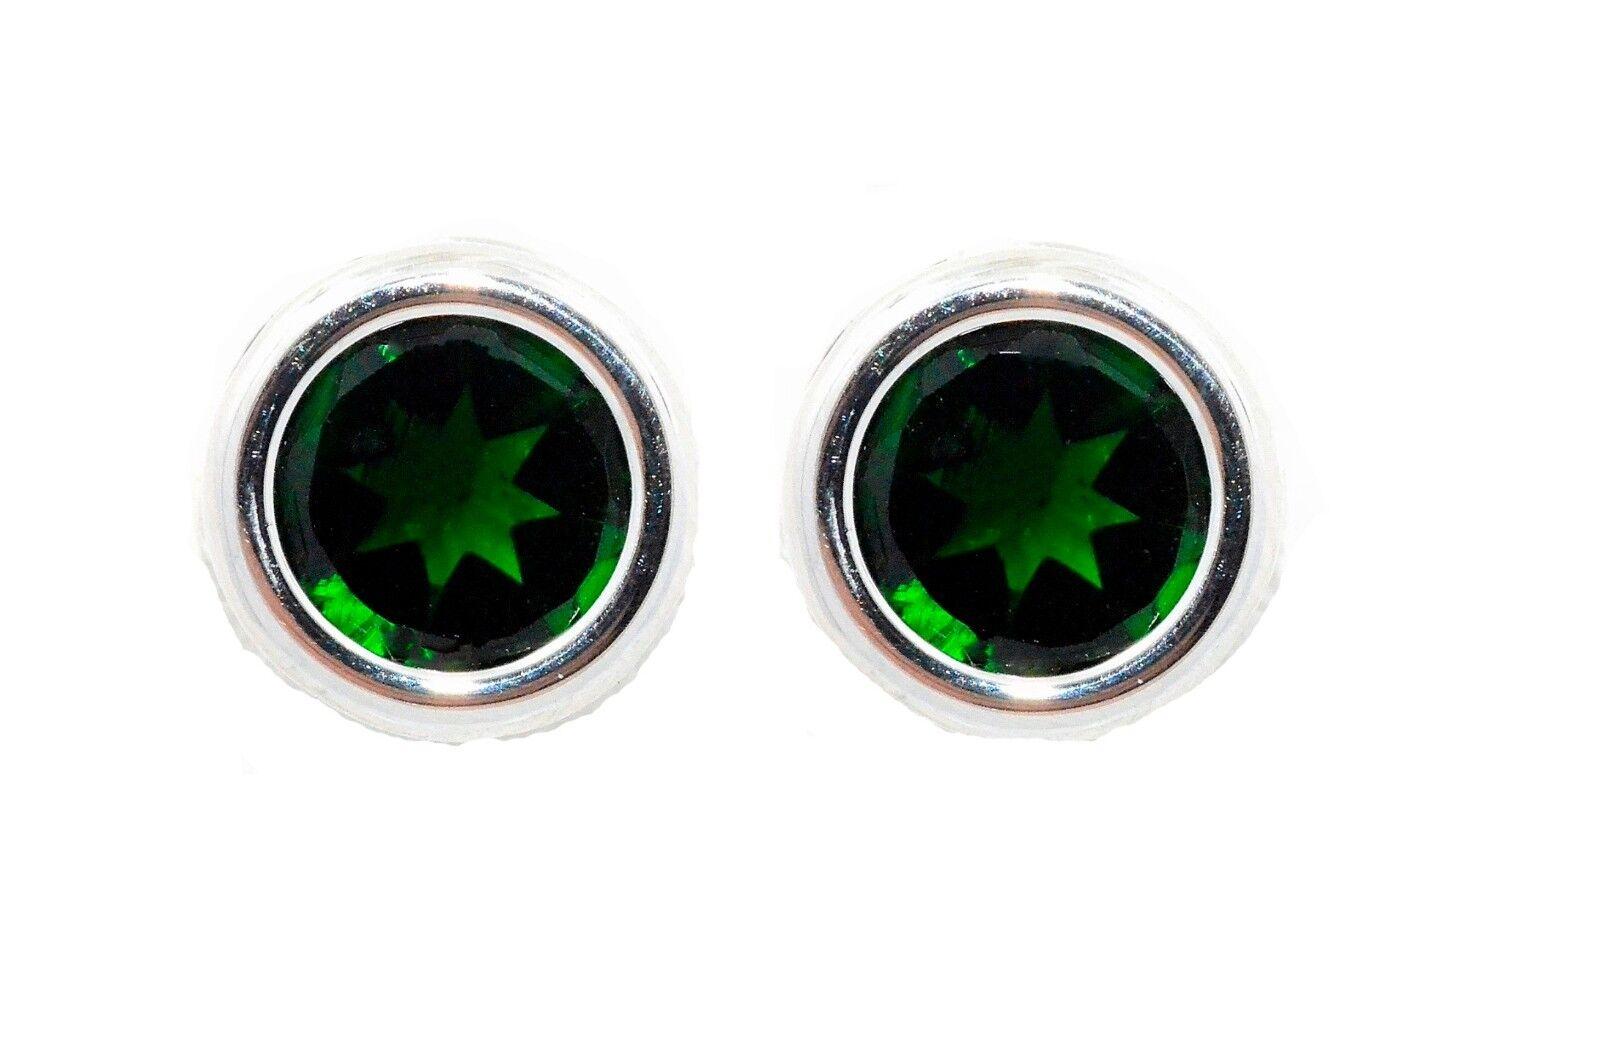 14Kt White gold 2 Ct Emerald 6mm Bezel Round Stud Earrings